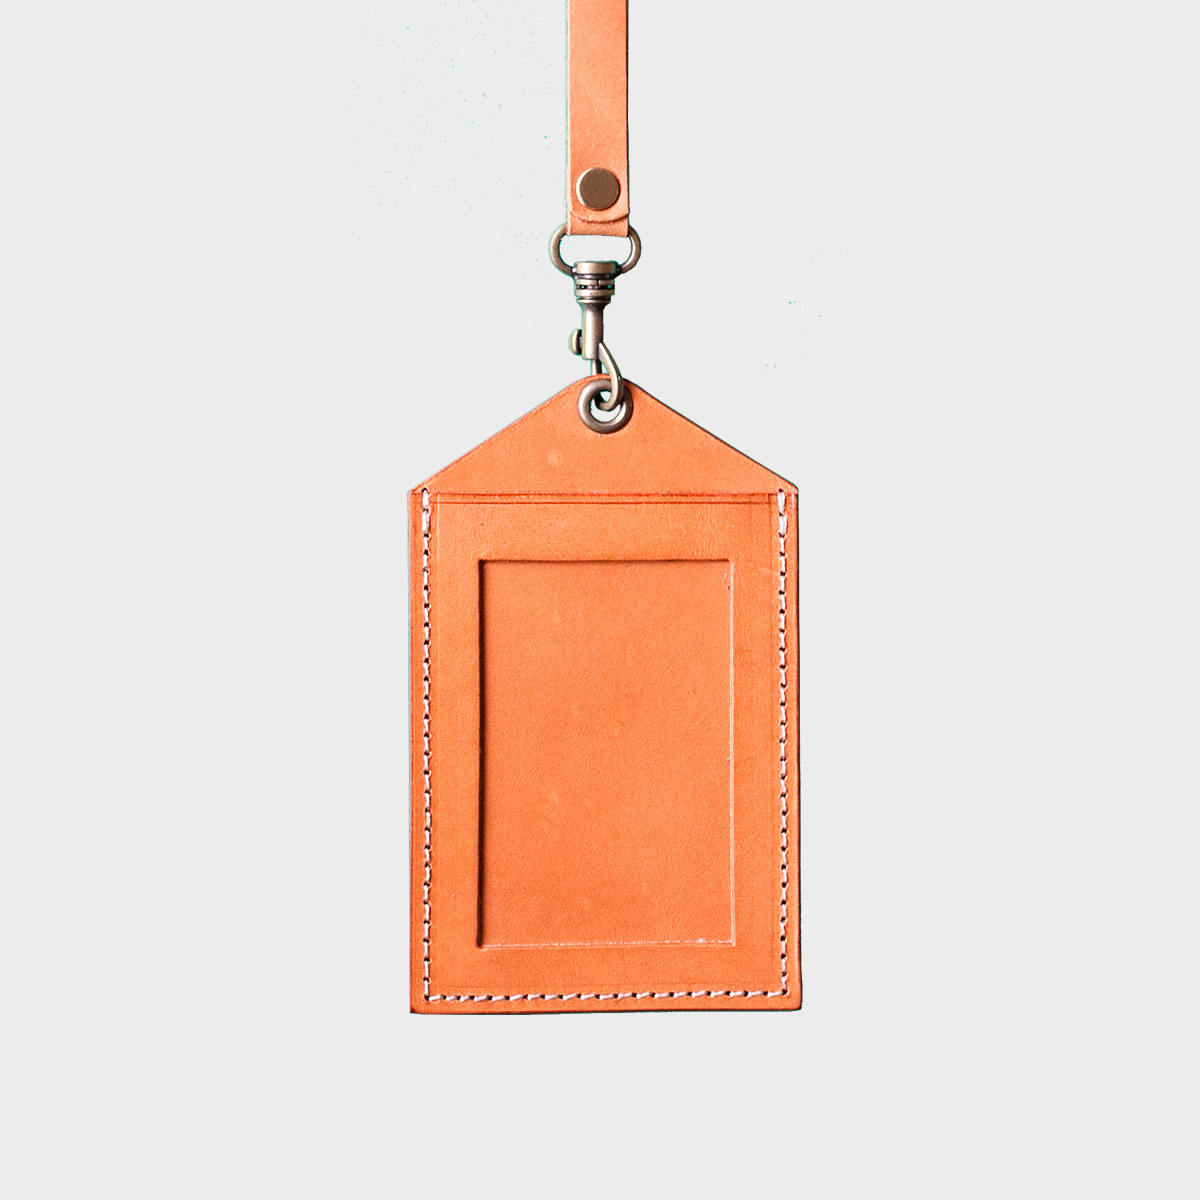 直式識別證套 Badge Holder, Vertical NT$ 1,380  HDB2015